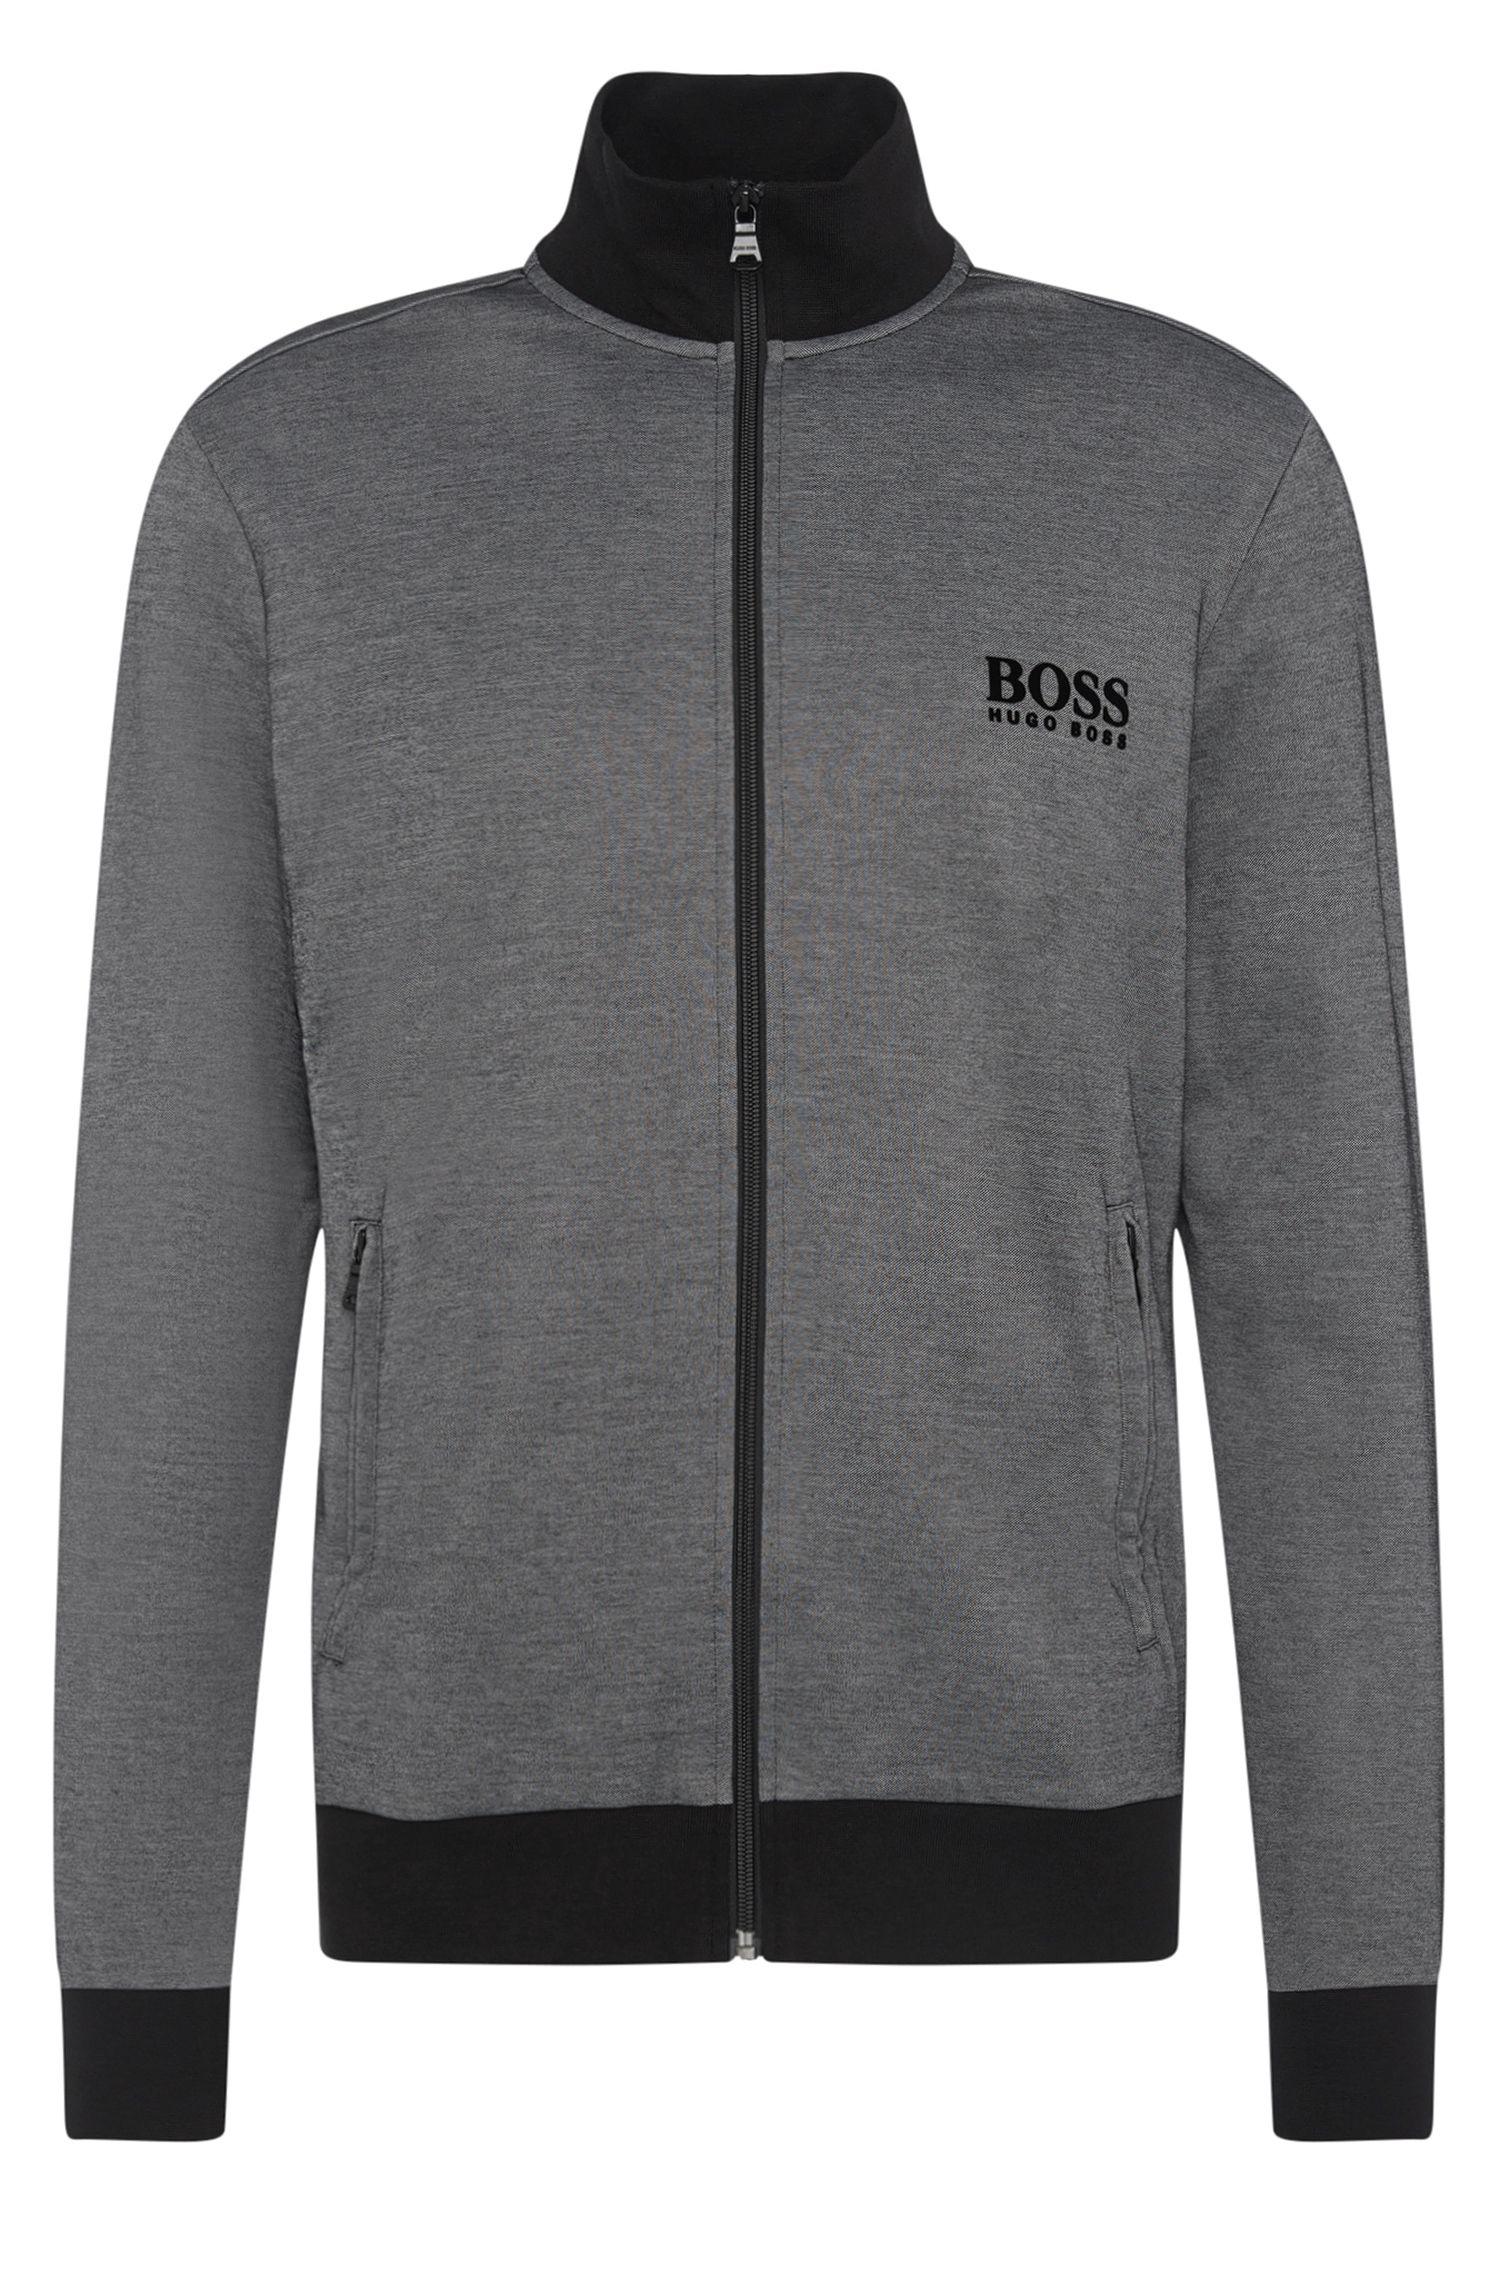 Mottled sweatshirt jacket in cotton blend: 'Jacket Zip'